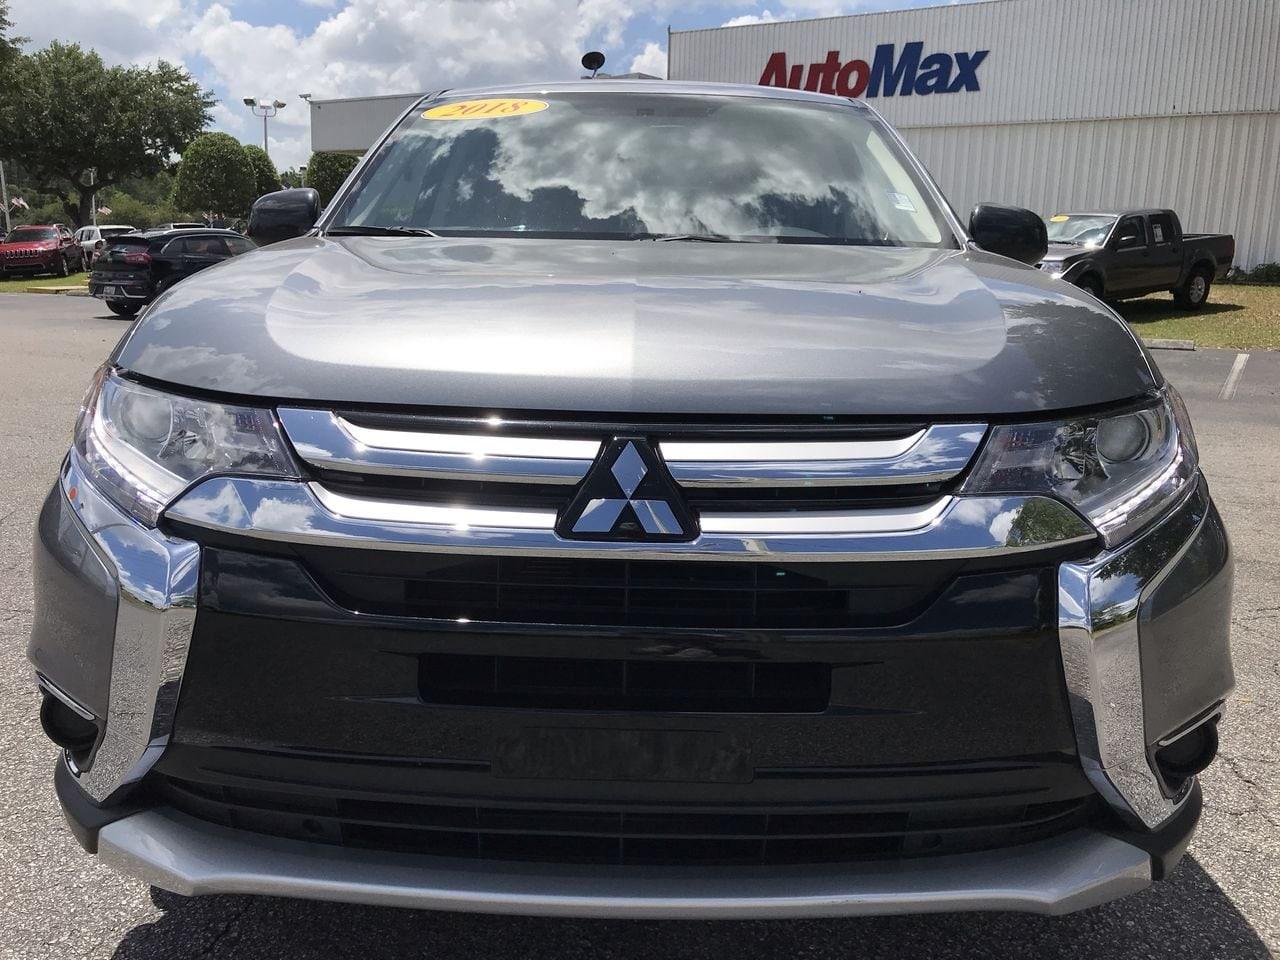 2018 Used Mitsubishi Outlander ES CUV For Sale | Ocala near Gainesville |  A4932